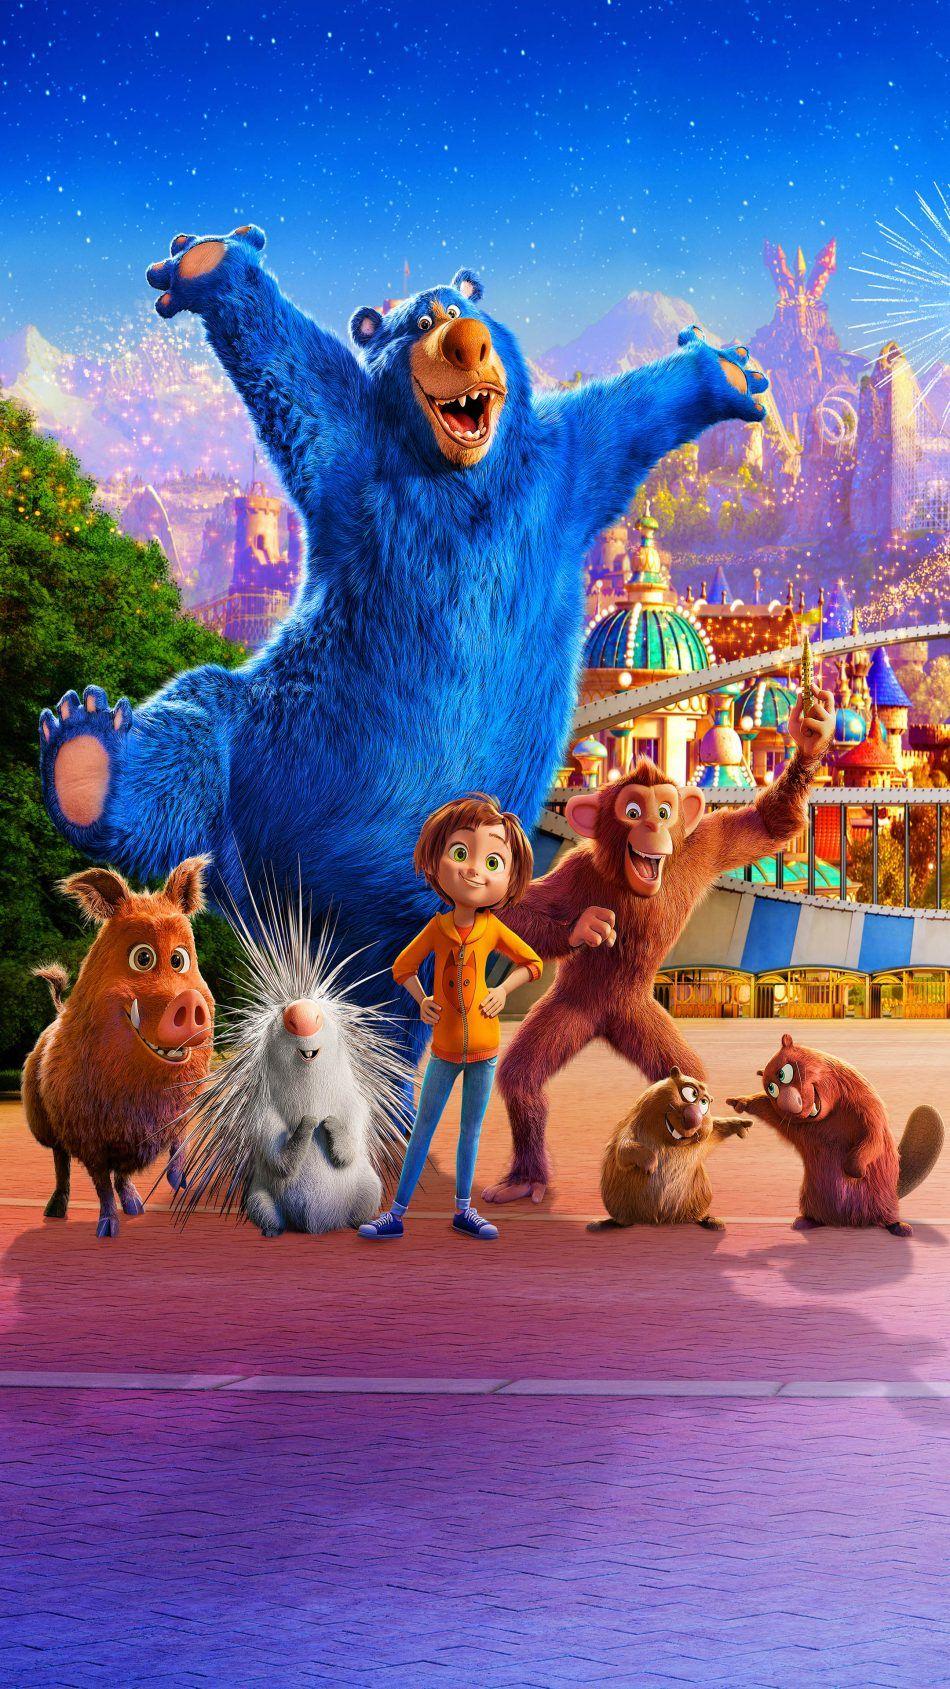 Wonder Park Animation Movie 2019 Animation, Cartoon